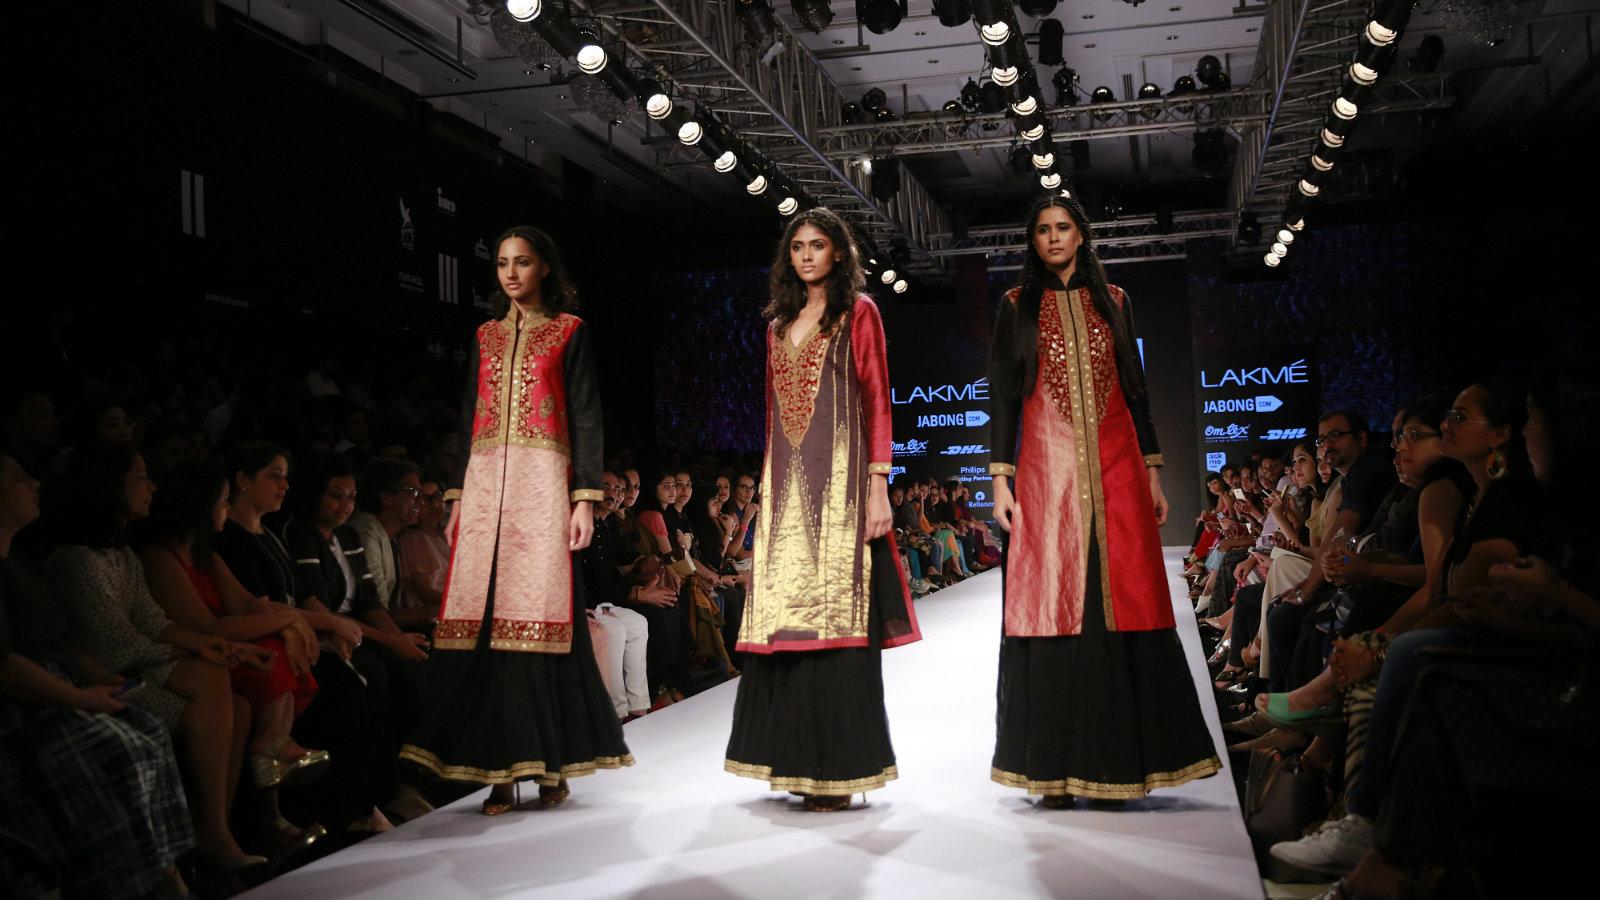 Indian models present creations of designer Ritu Kumar during the Lakme Fashion Week in Mumbai, India, Thursday, Aug. 27, 2015.